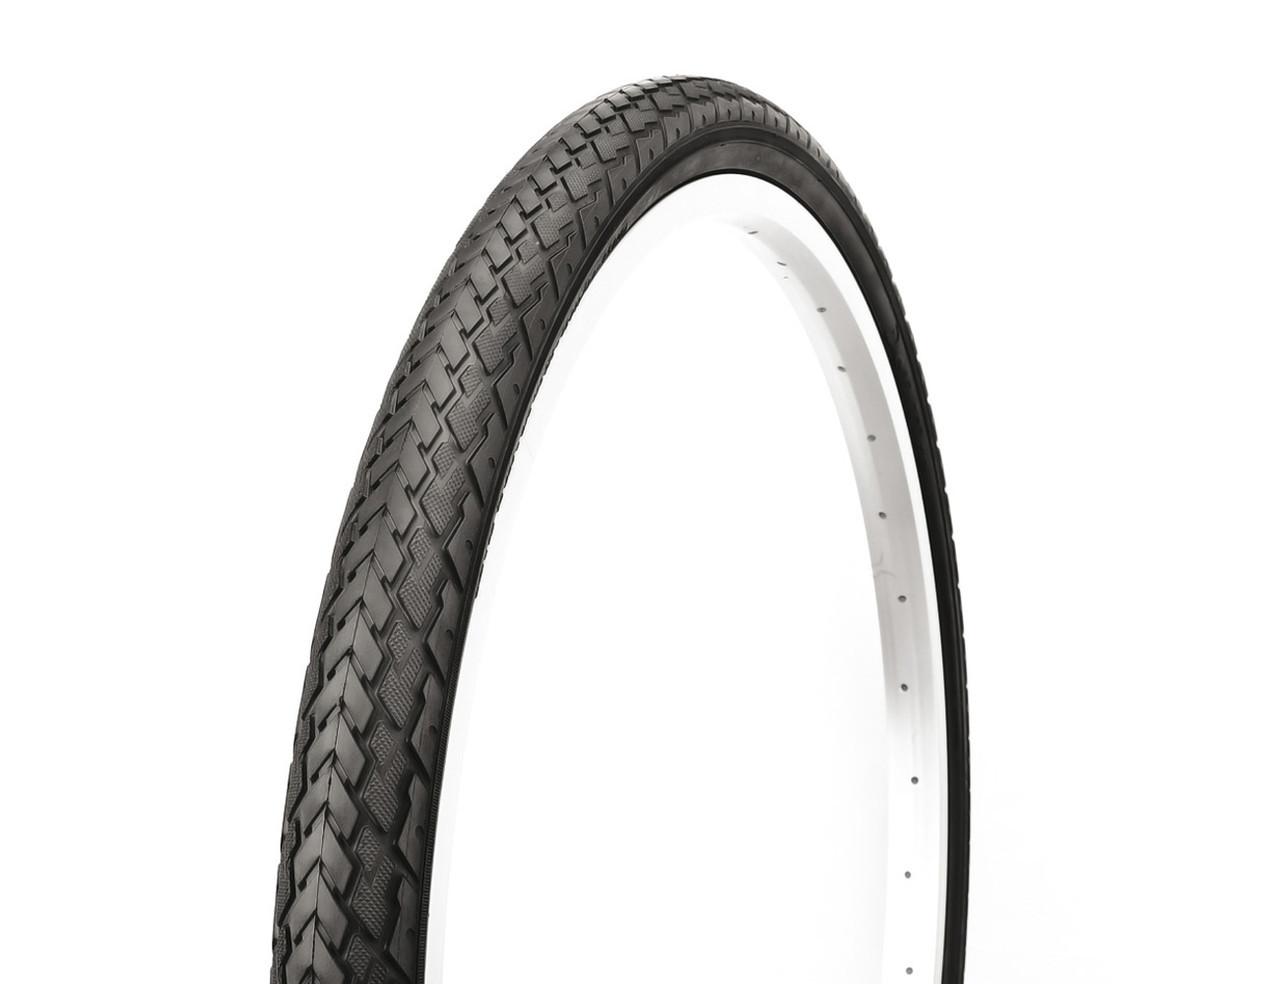 Велопокрышка 29x1.75, 44-622, SA-225 Deli Tire with skinwall